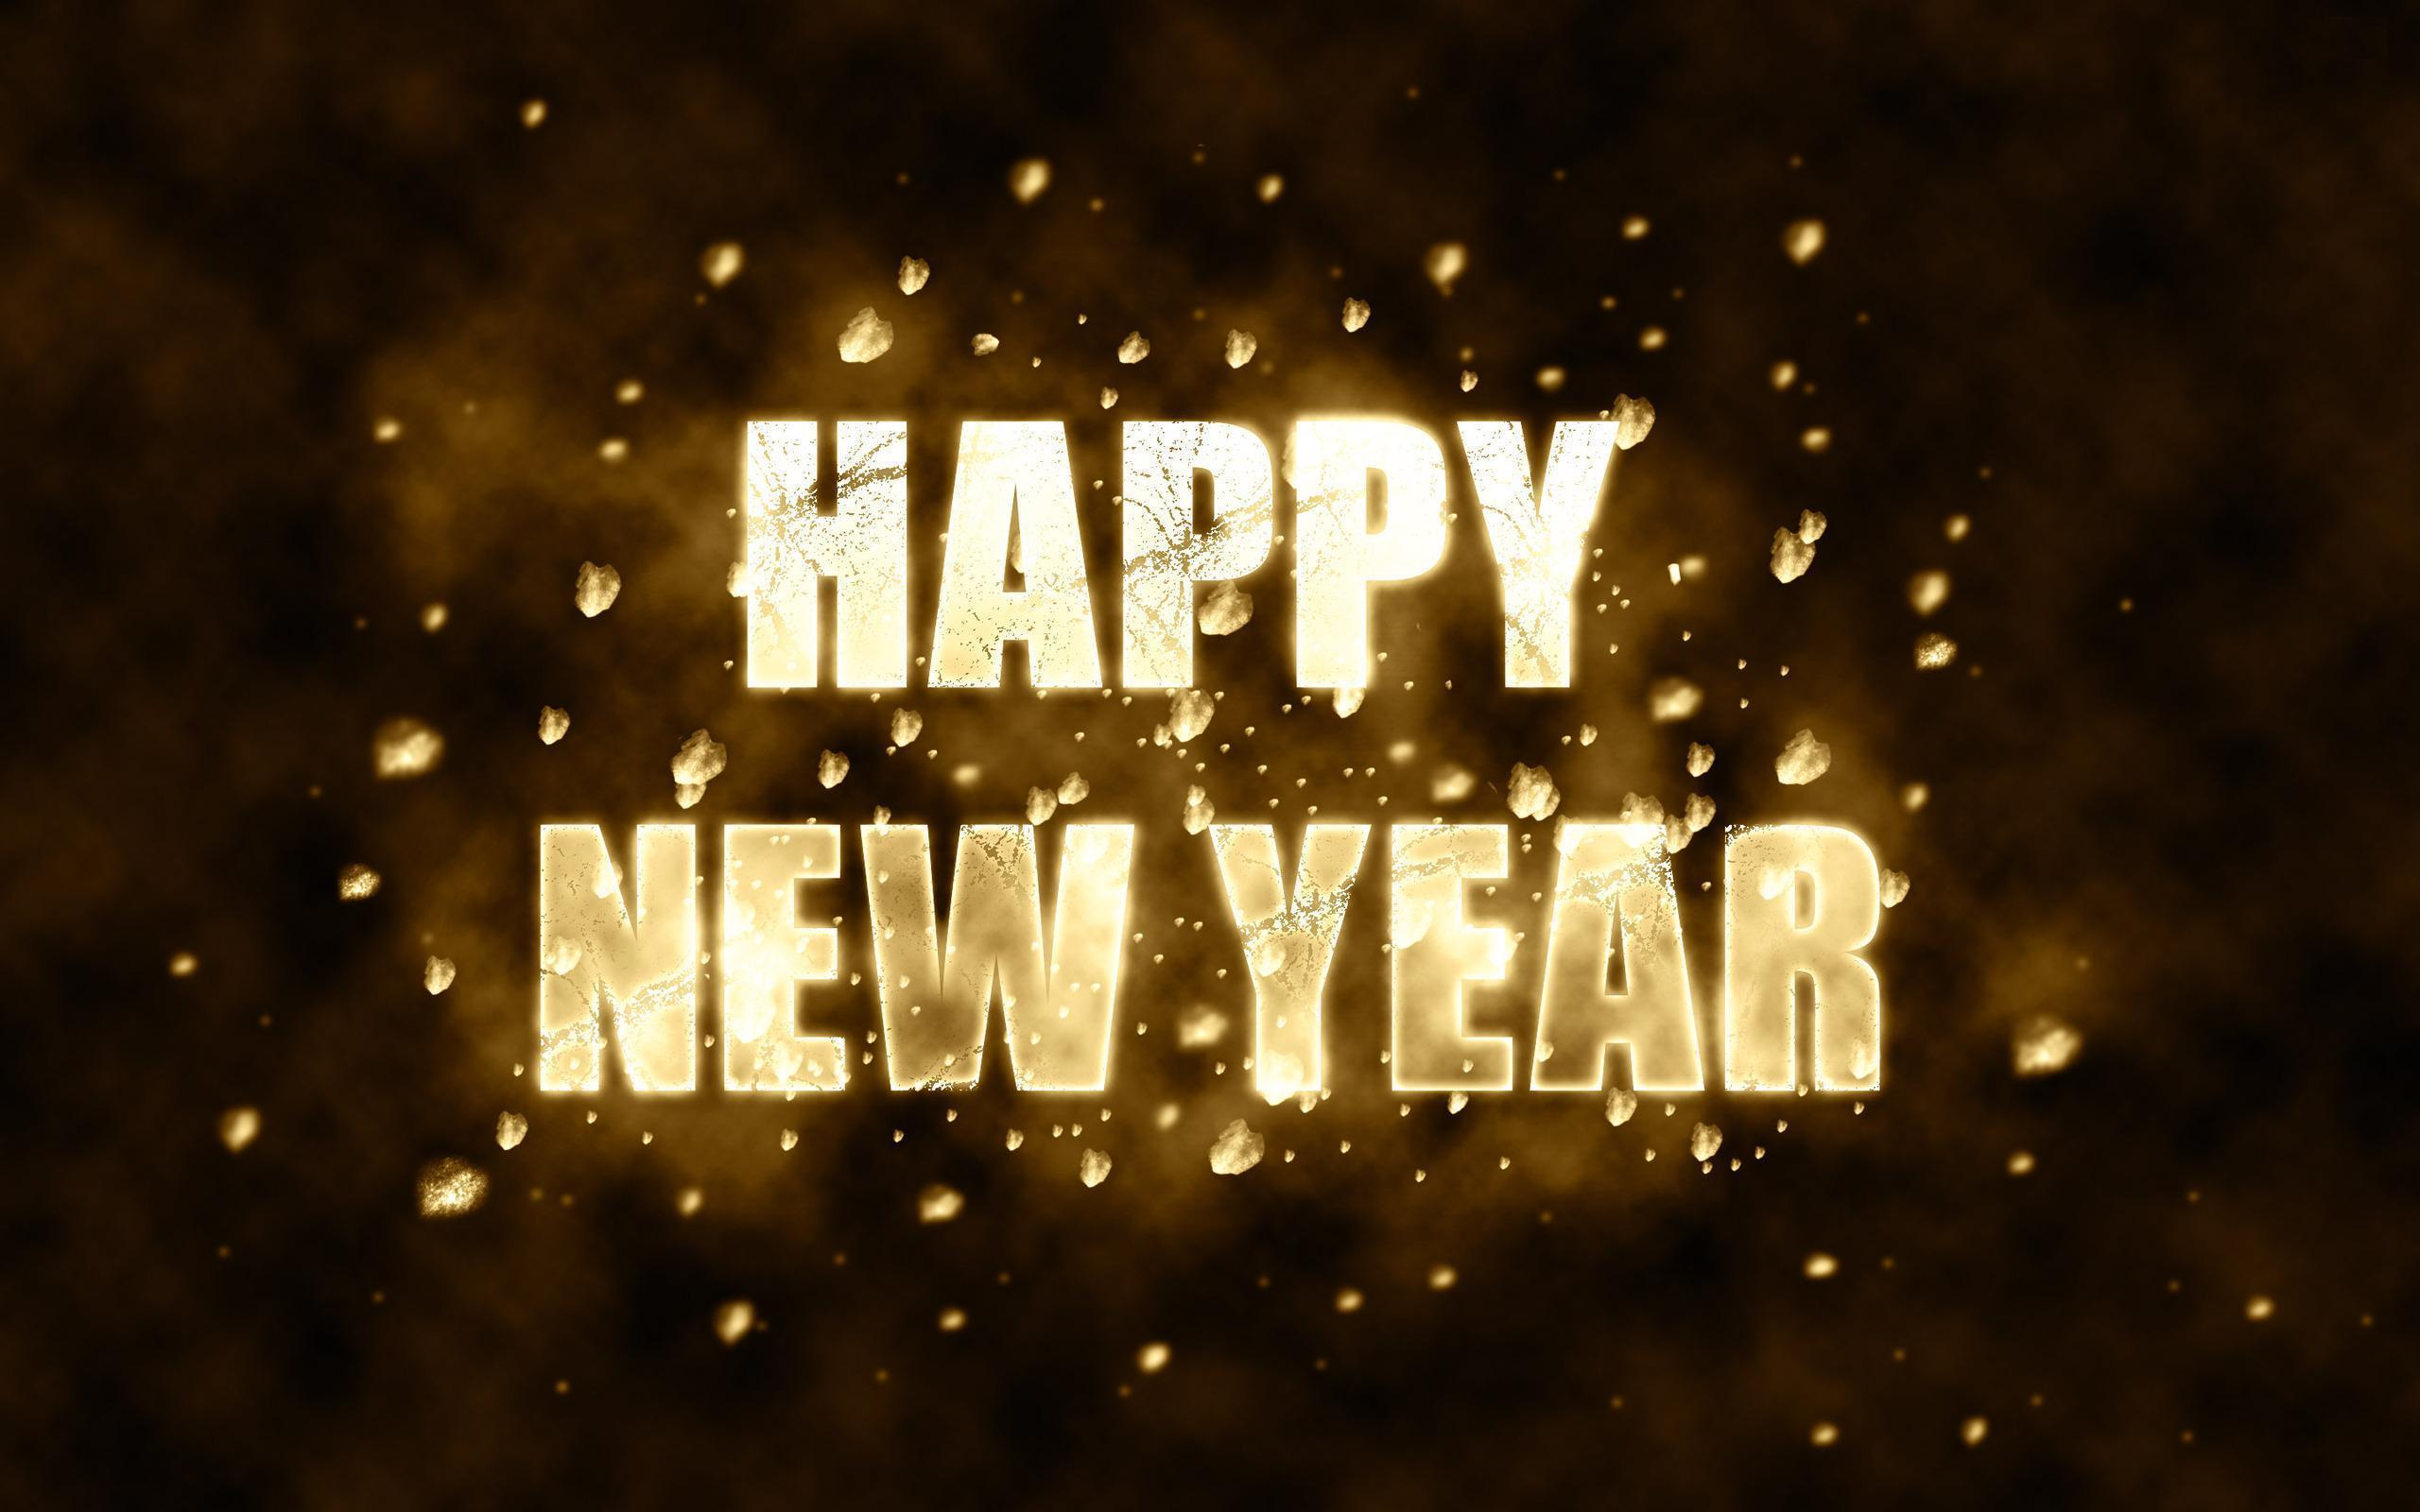 Happy New Year Hd Background Wallpaper 30 HD Wallpapers | www.